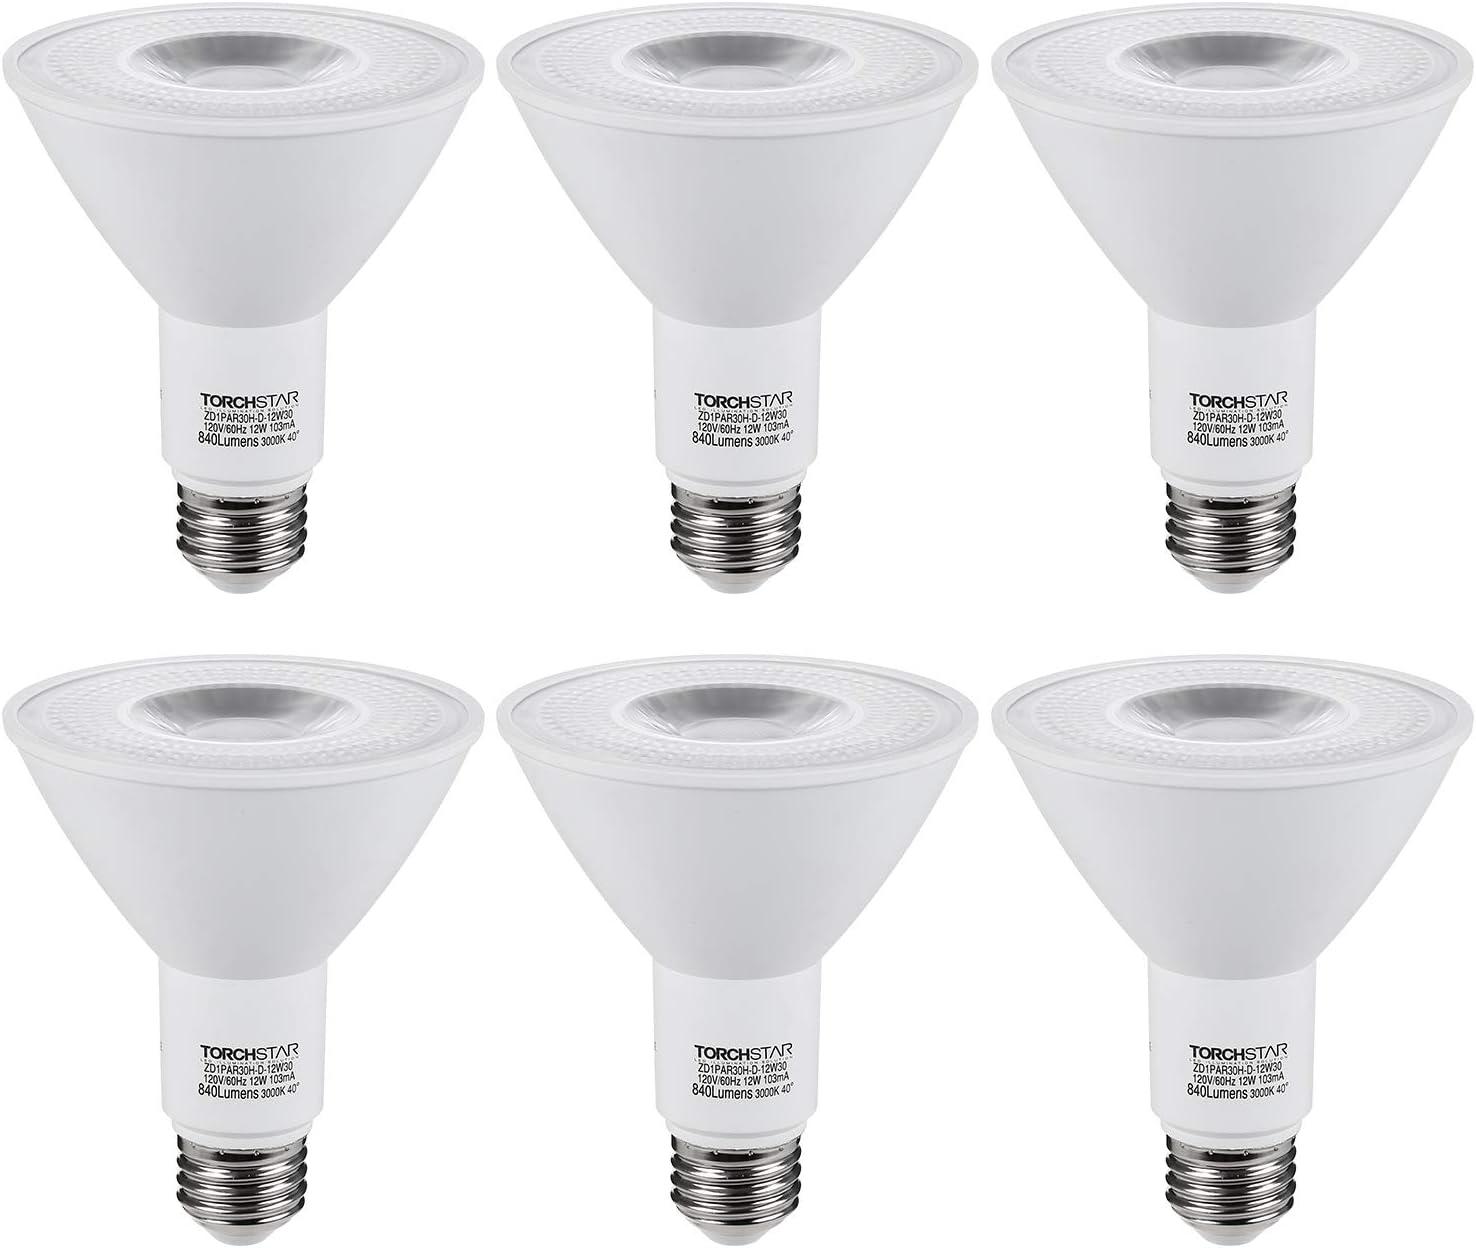 TORCHSTAR PAR30 Dimmable LED Spotlight Bulbs, Long Neck, CRI90+, 12W (75W Eqv.), UL & Energy Star Listed, E26 Standard Base, 840Lm, 3000K Warm White, for Recessed Trim Lighting, Track Light, Pack of 6